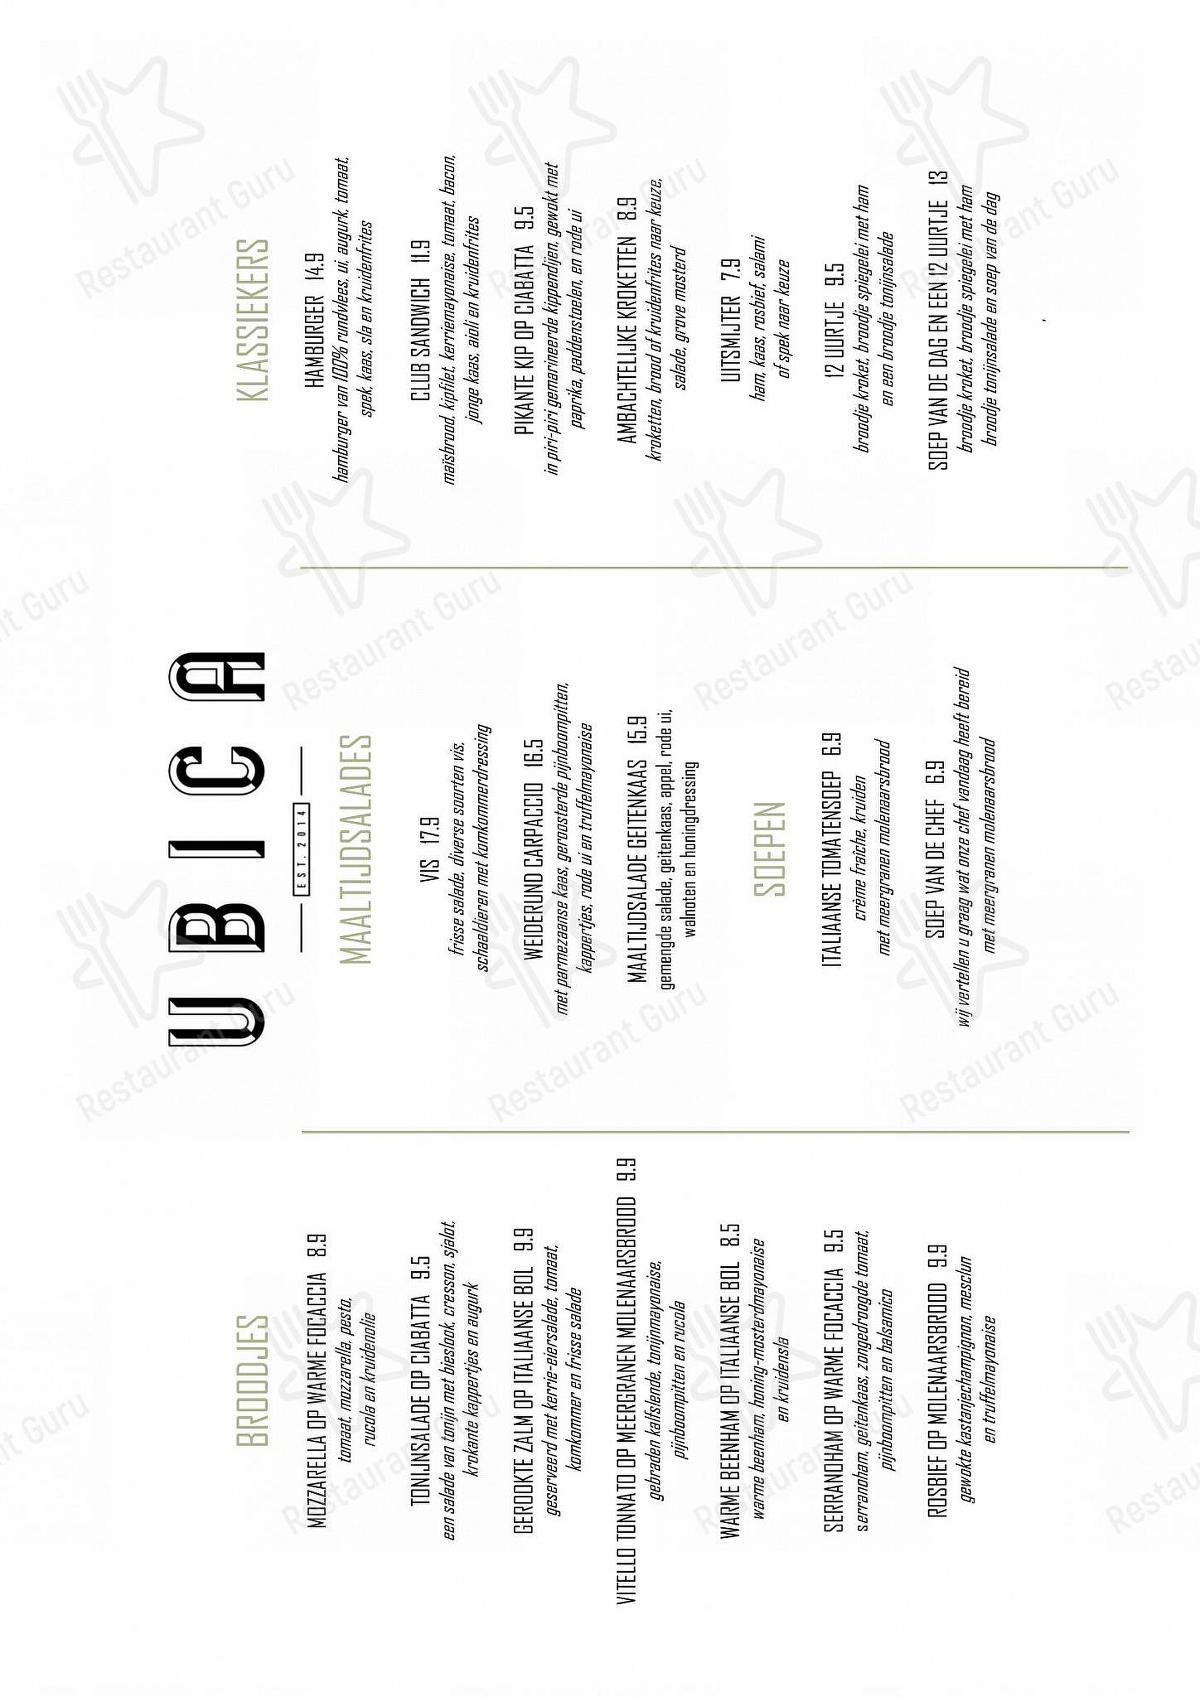 Ubica menu - meals and drinks